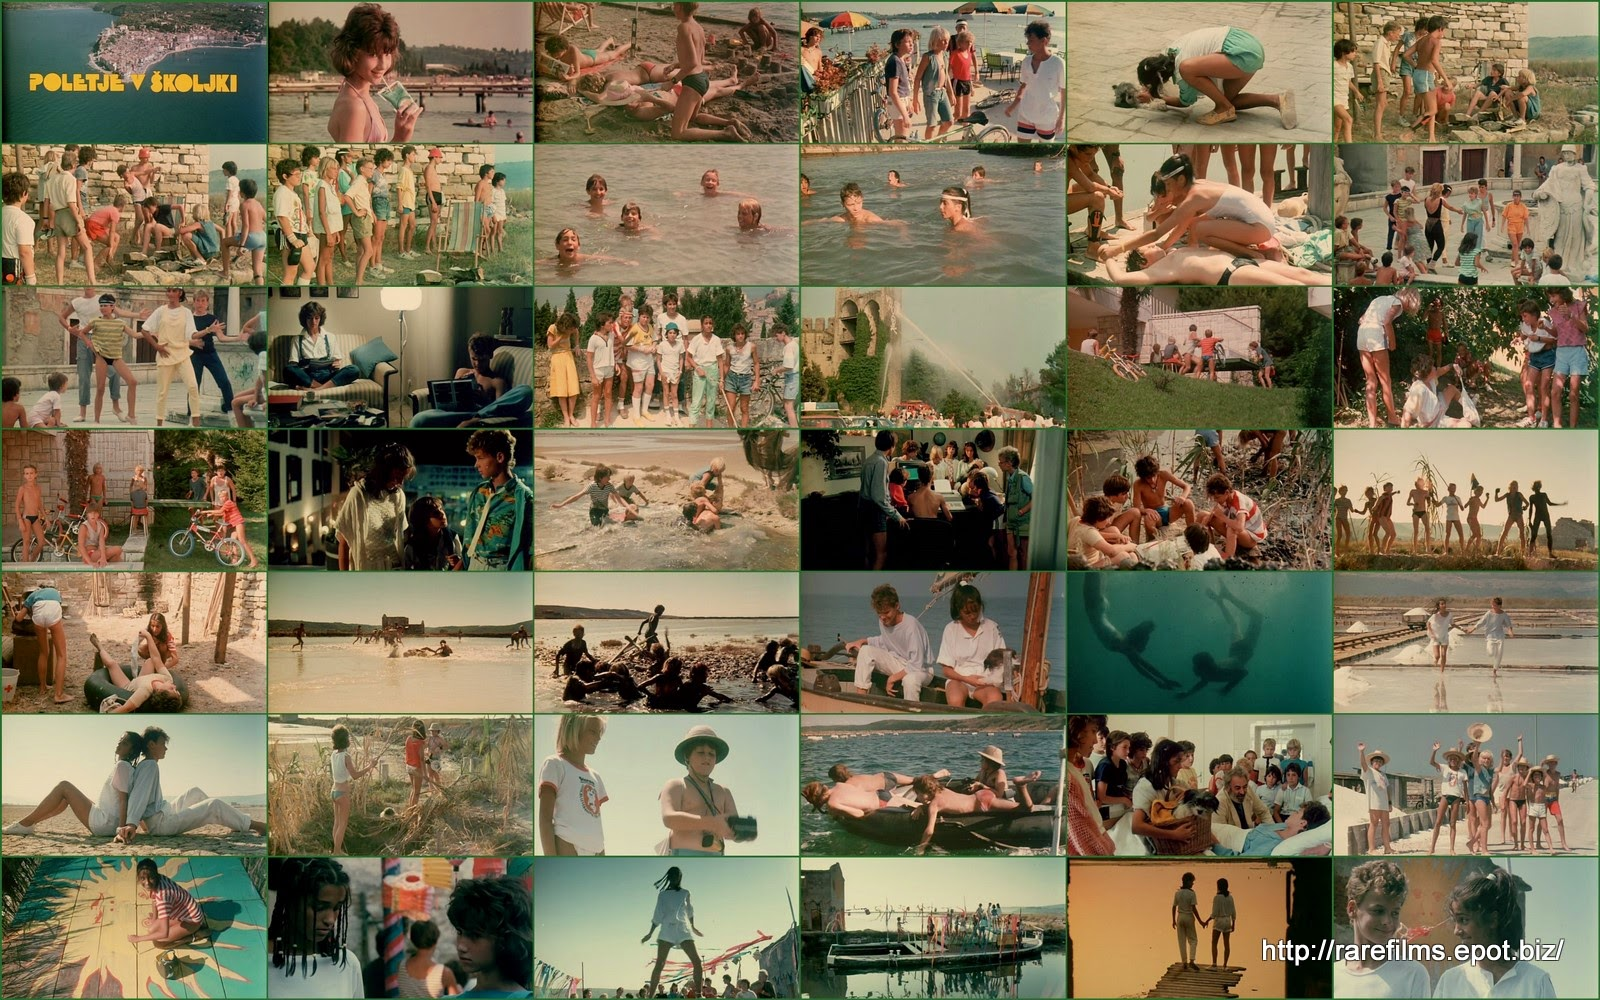 Лето в раковине / Poletje v školjki / A Summer in a sea-shell.